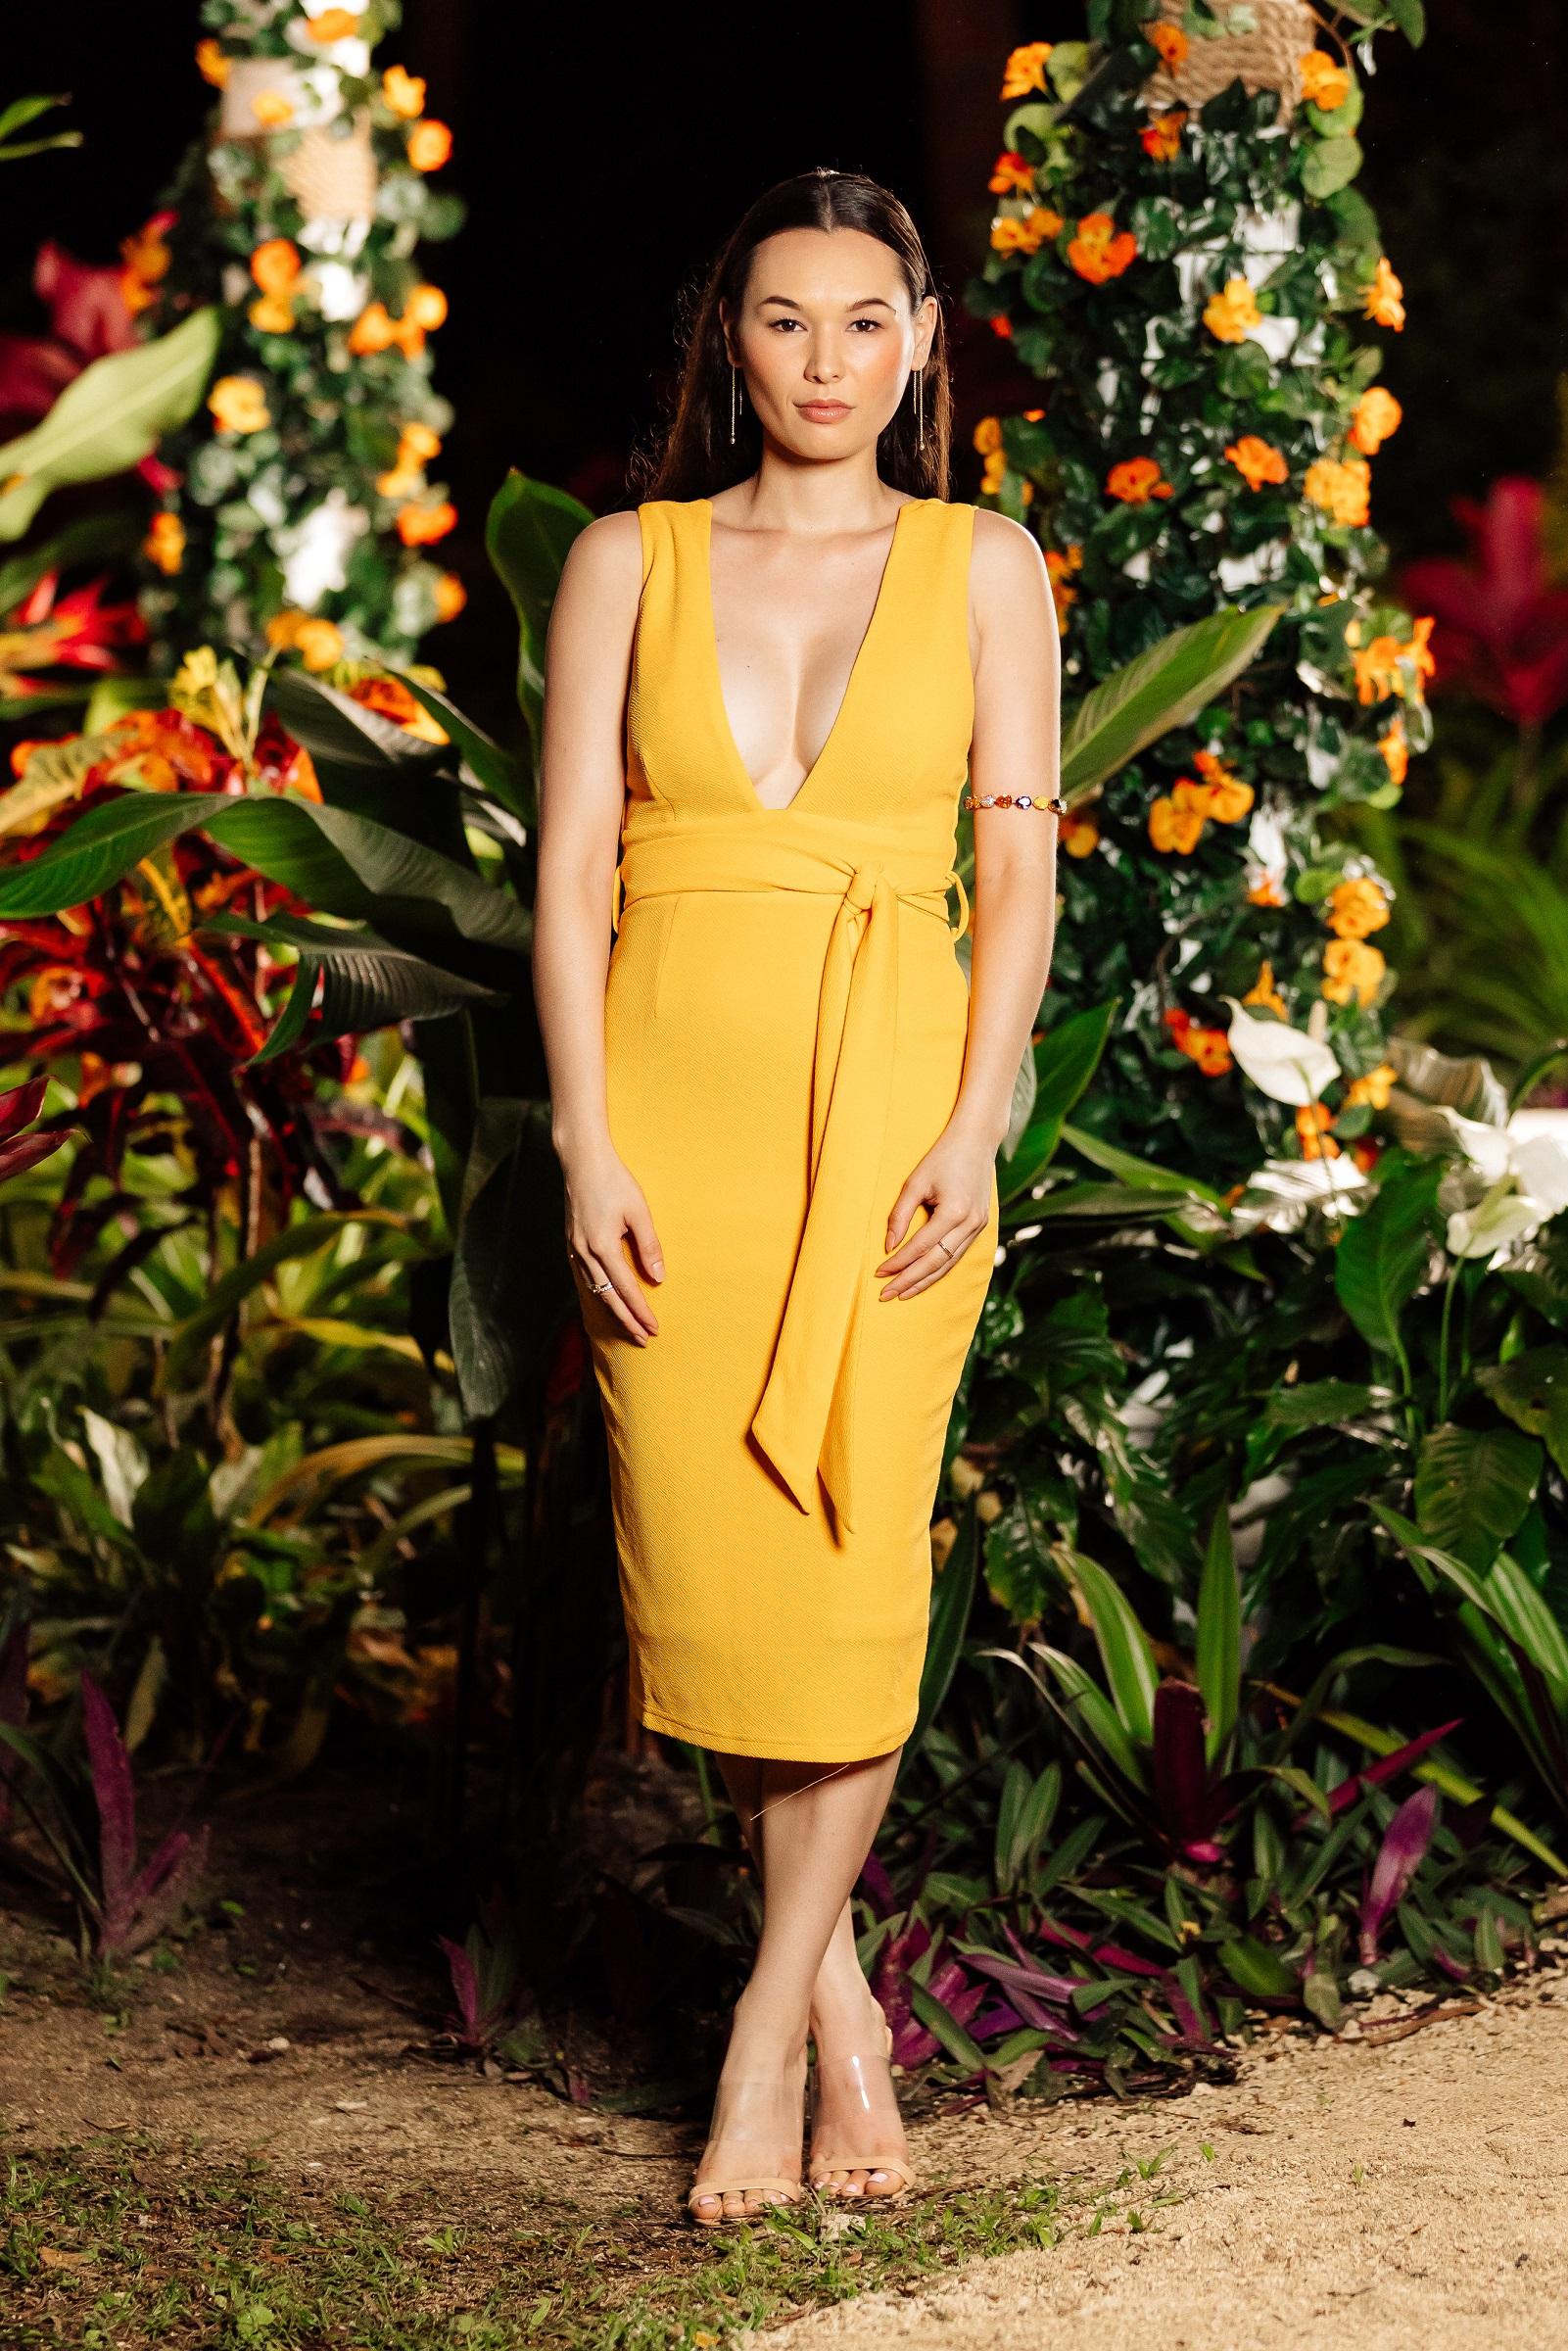 Vanessa Sunshine - Bachelor in Paradise  Source: 10 Network